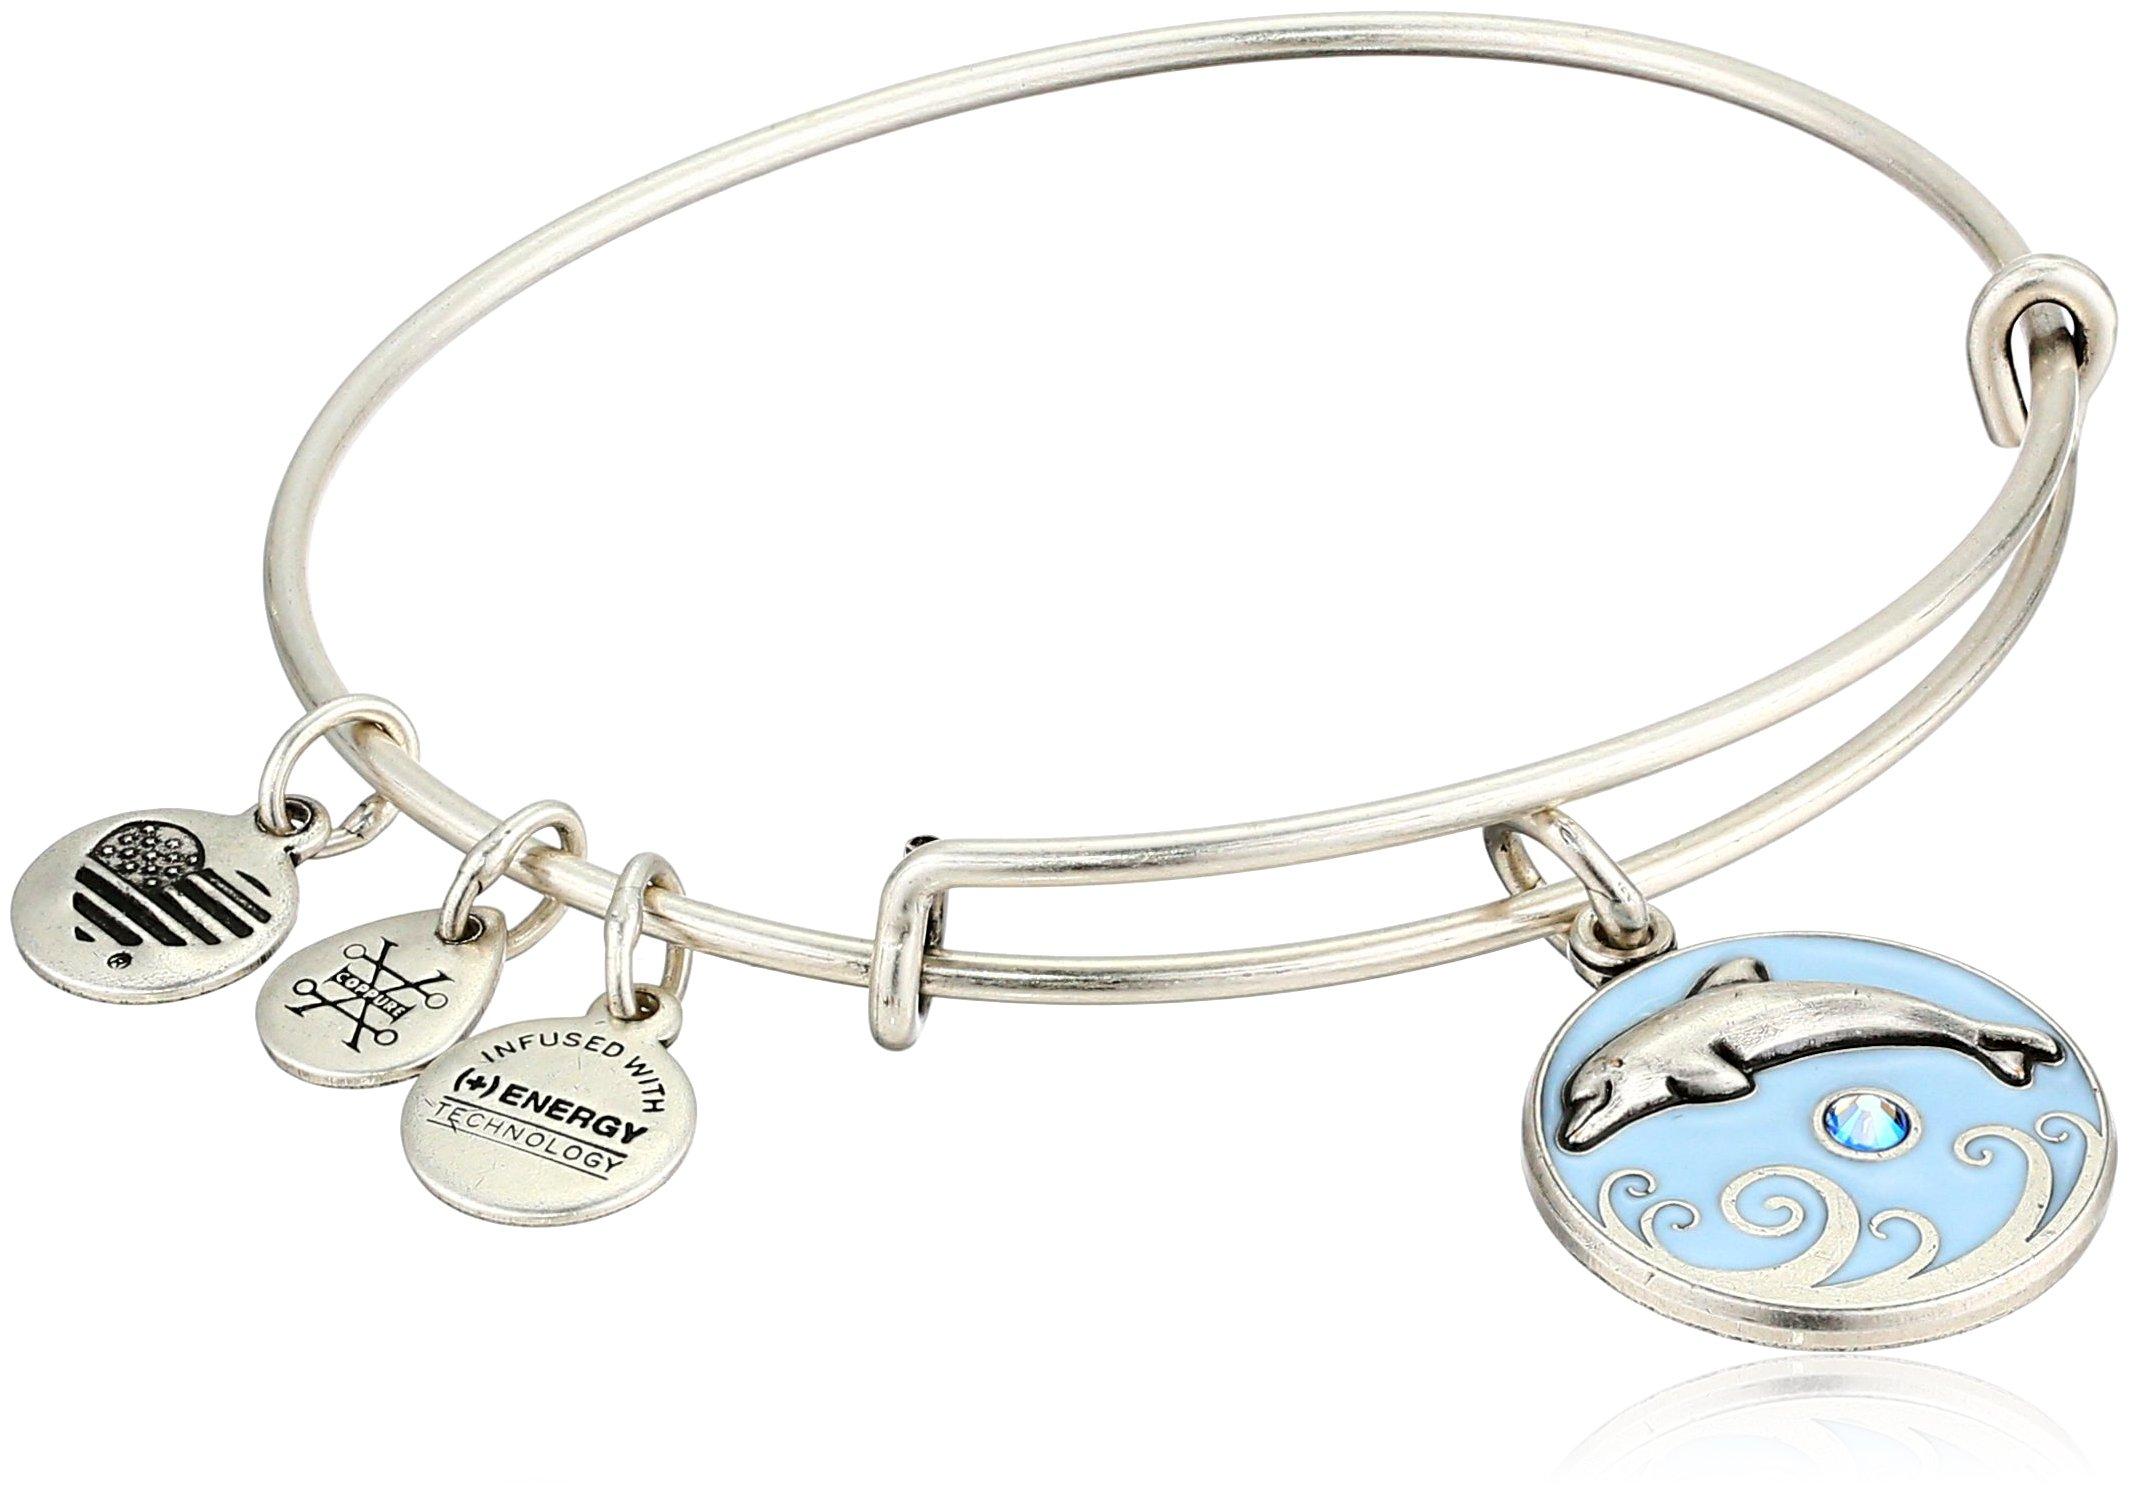 Alex and Ani Women's Color Infusion, Dolphin Charm Bangle Bracelet, Rafaelian Silver, Expandable